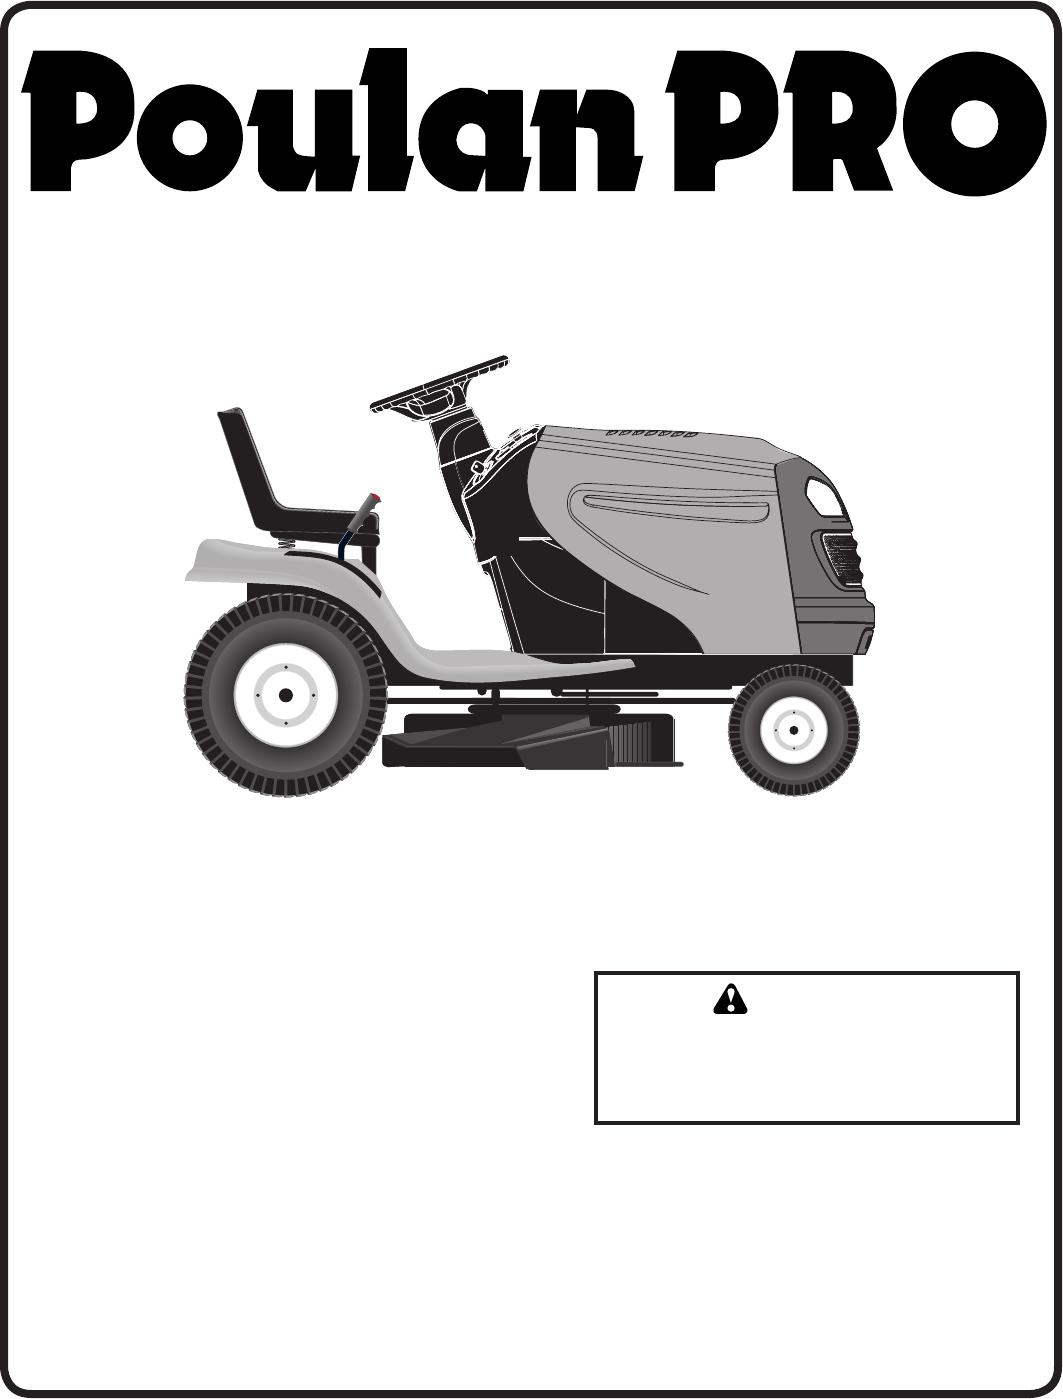 Poulan PB20H42LT Lawn Mower User Manual